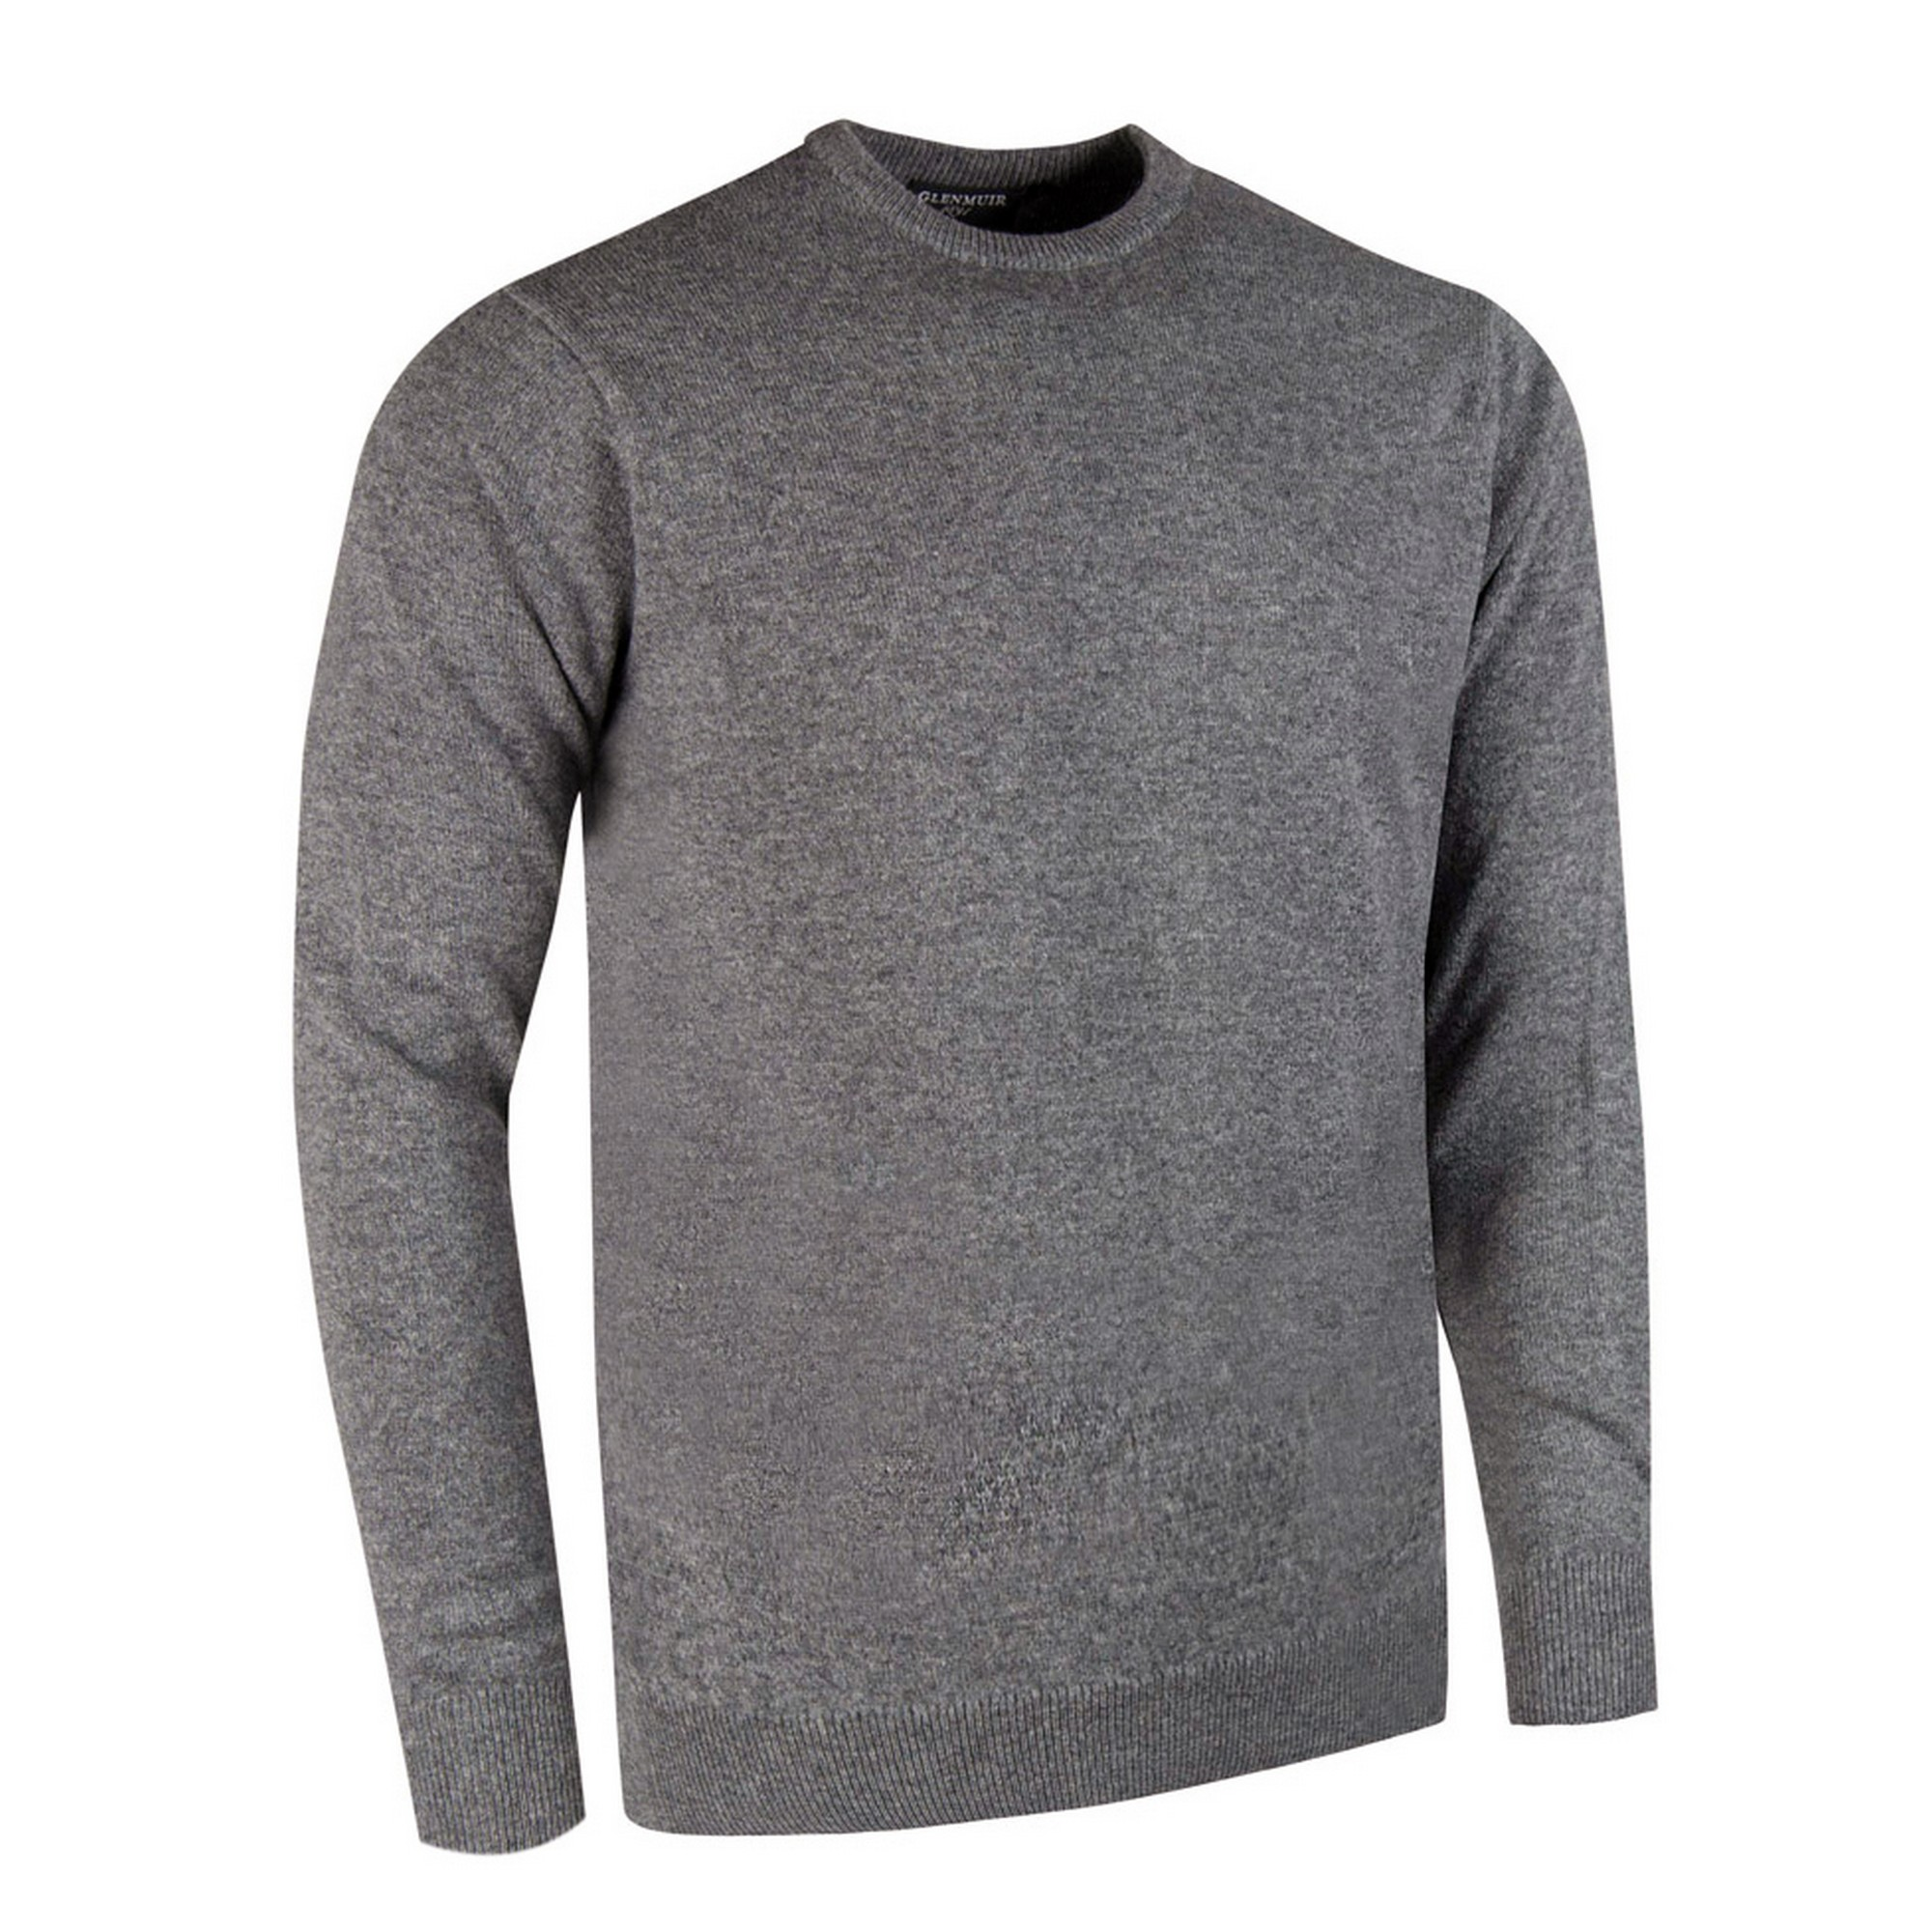 Glenmuir Morar Mens Crew Neck Sweater (L) (Charcoal)